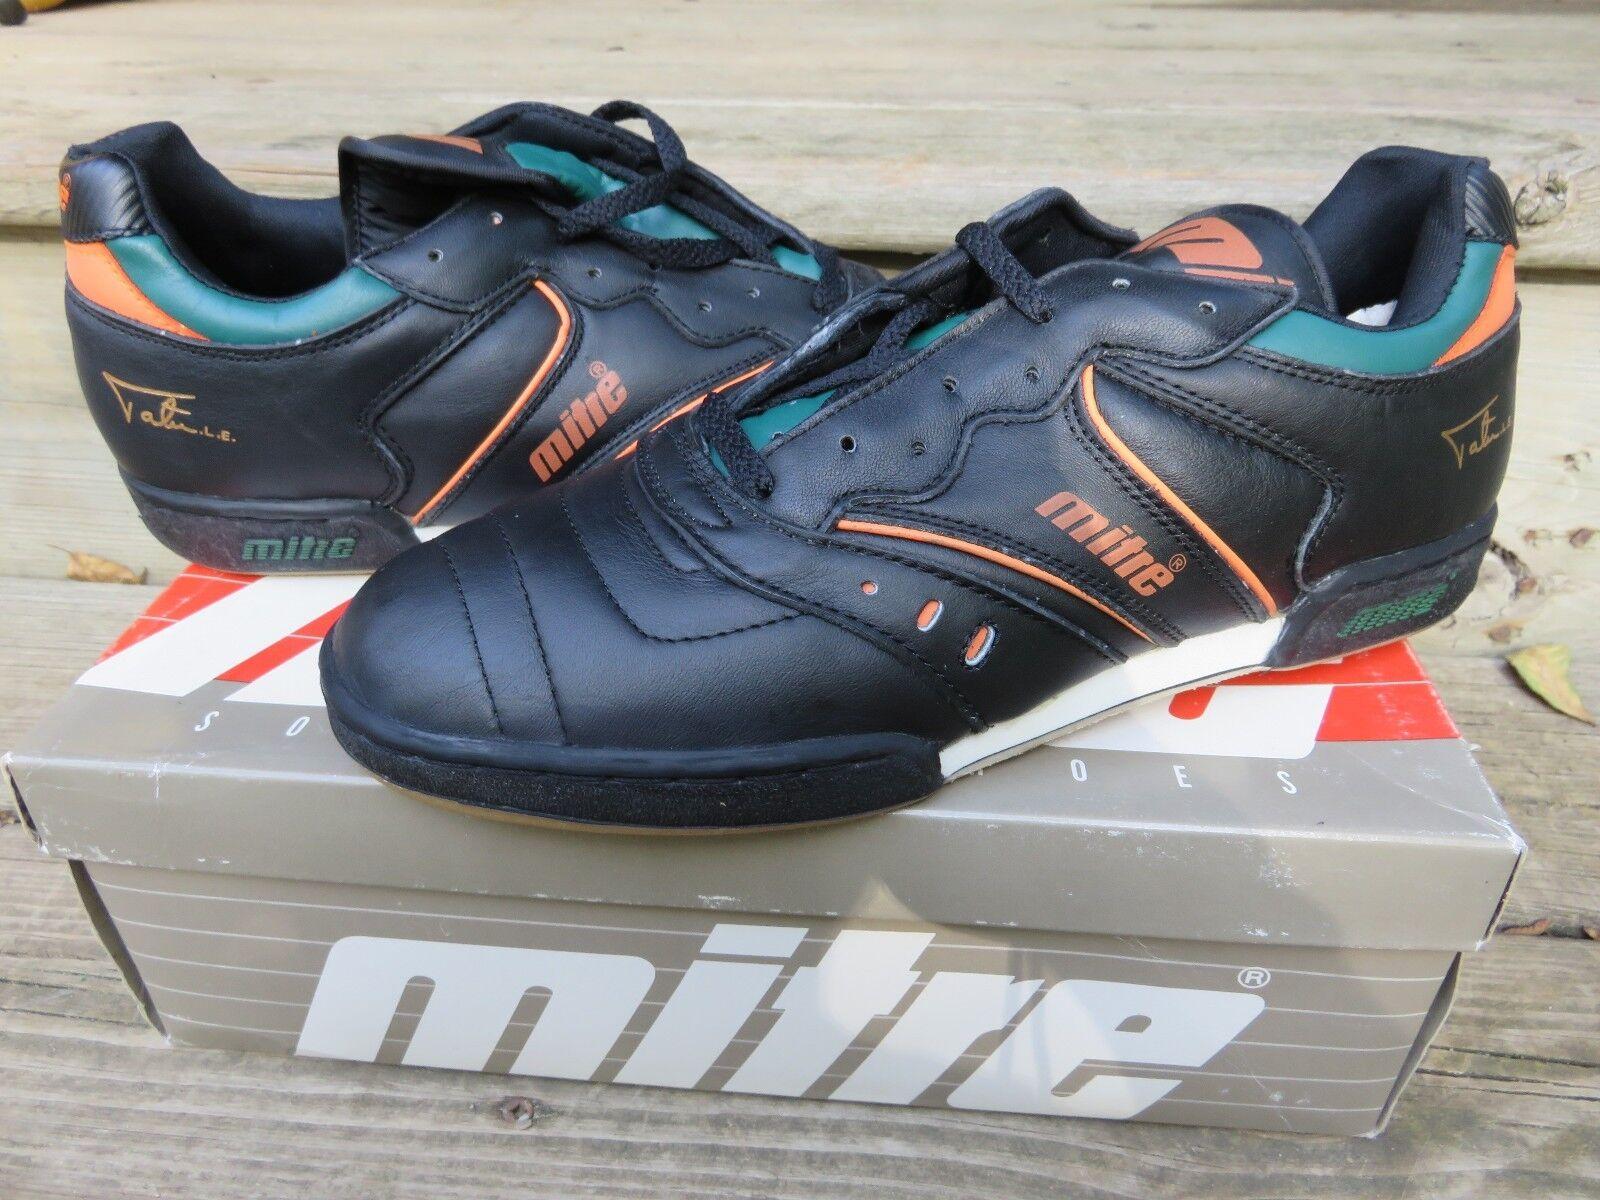 NOS Mitre Tatu Le Soccer Size 9.5 Athletic Indoor Cleats shoes Vintage NEW